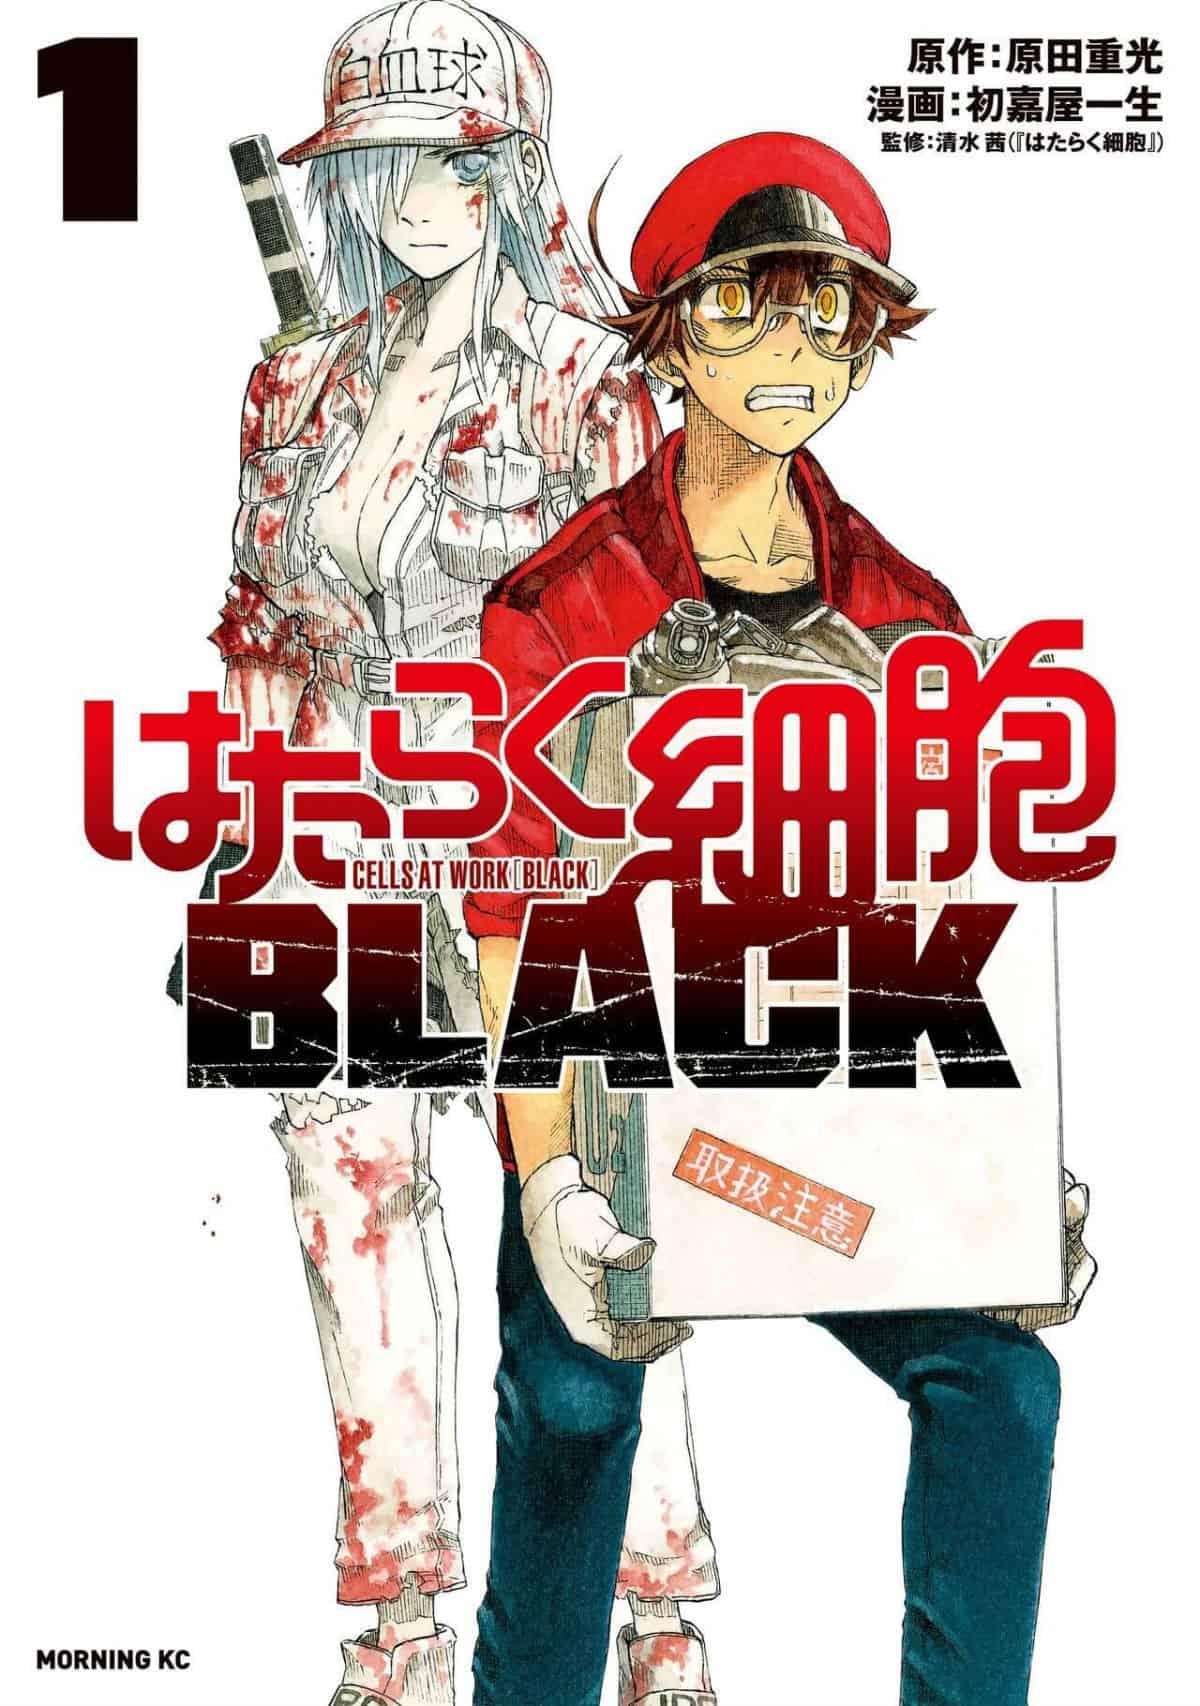 Cells At Work BLACK Manga Volume 1 Cover Art